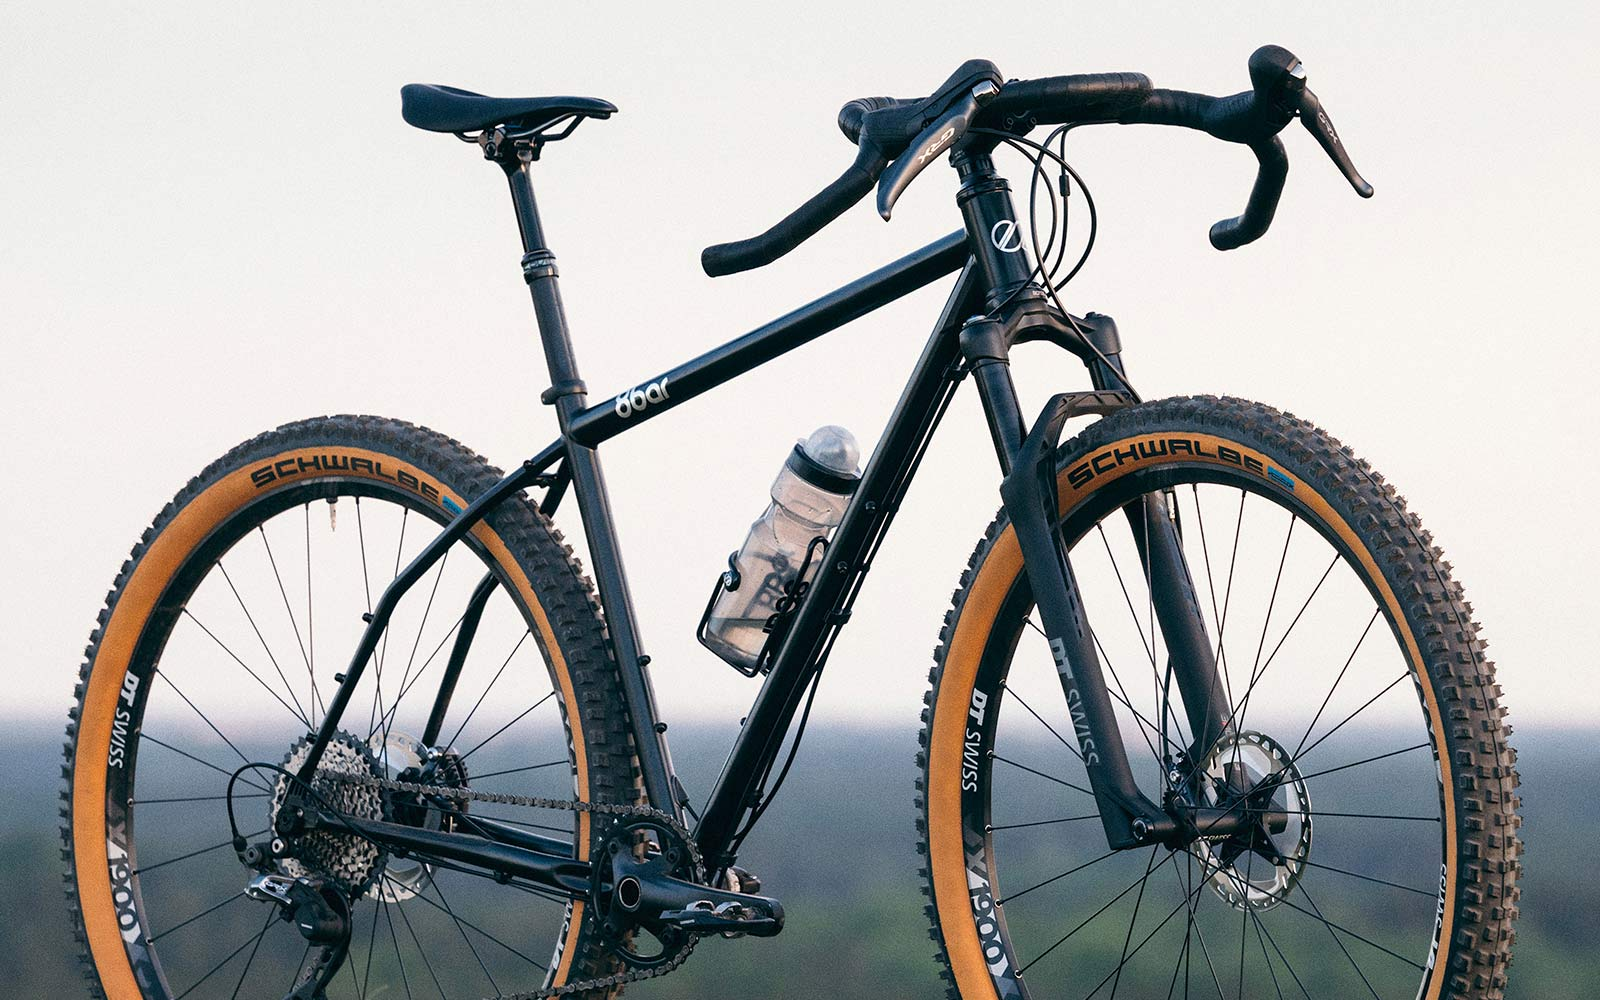 8bar Tflsberg steel off-road adventure bikepacking mountain bike, photo by Stefan Haehnel,angled detail